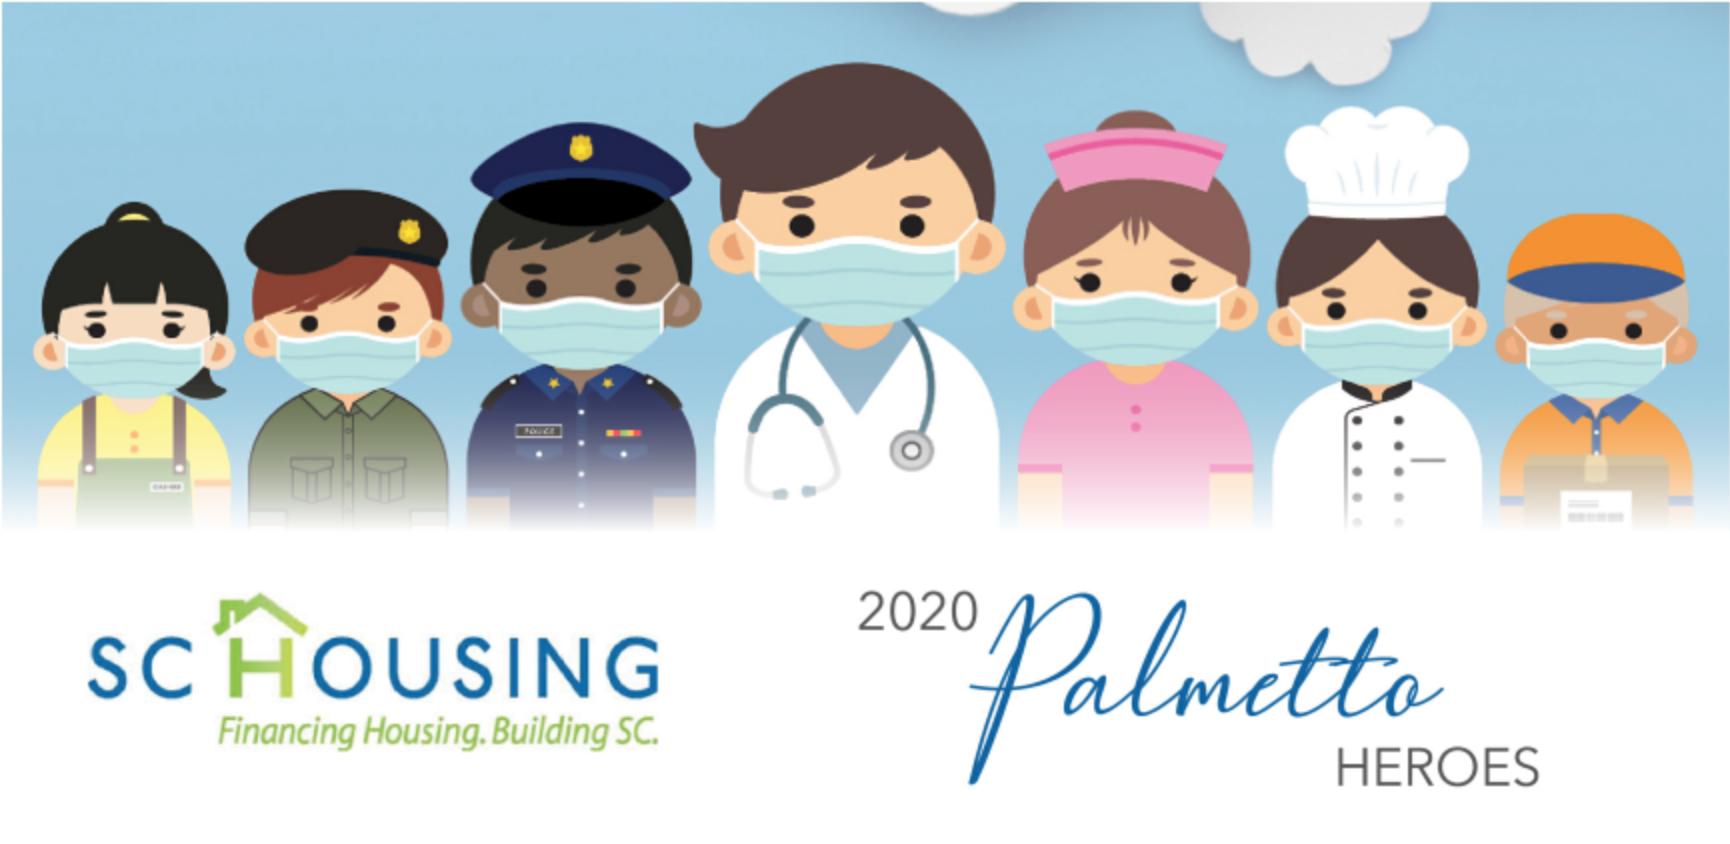 2020 Palmetto Heroes Program - SC Housing